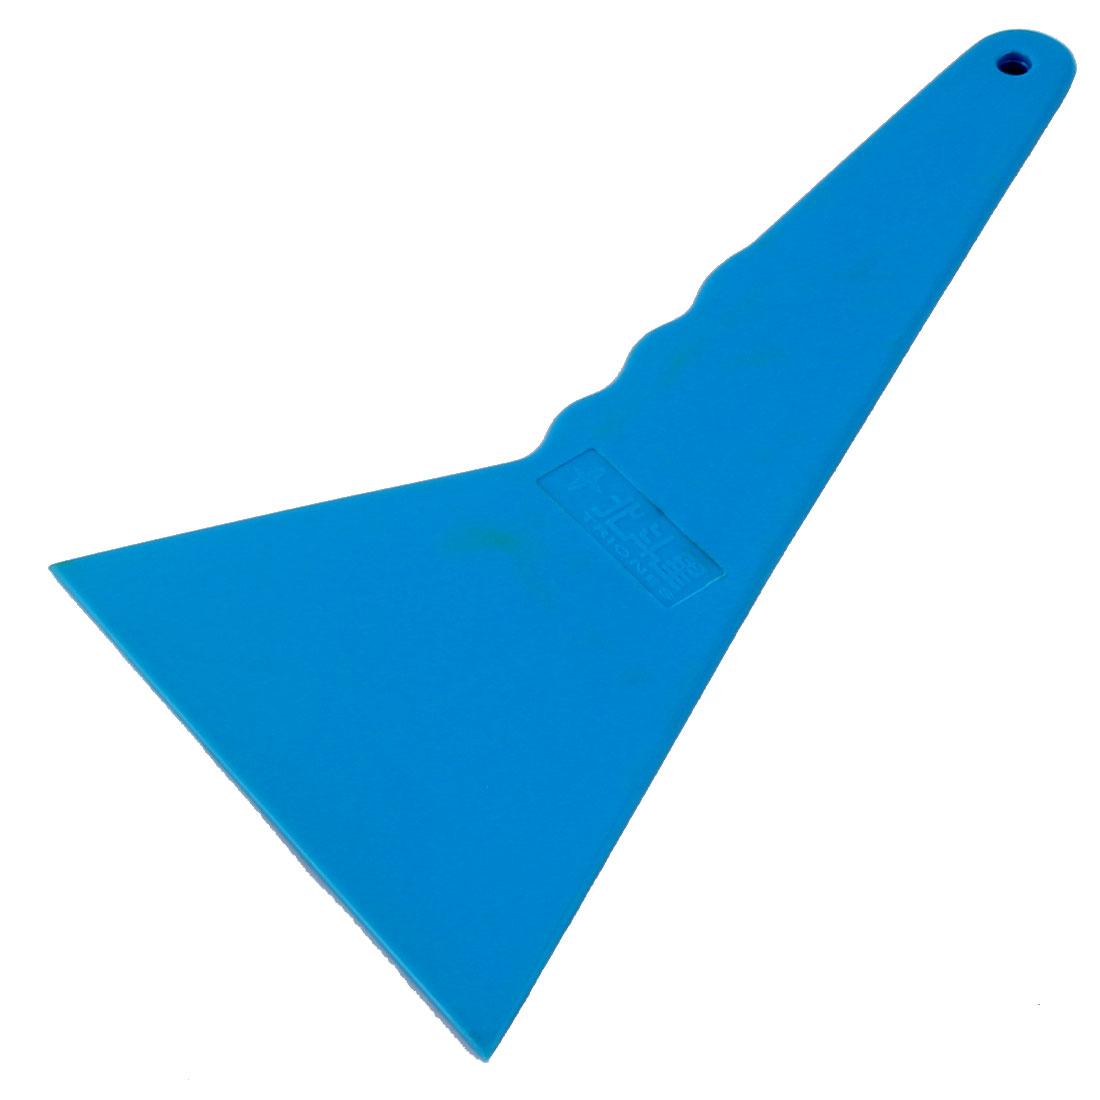 Car Auto Window Film Wrap Cleaning Scraper Tinting Tool Blue 20.8 x 12 x 0.5cm